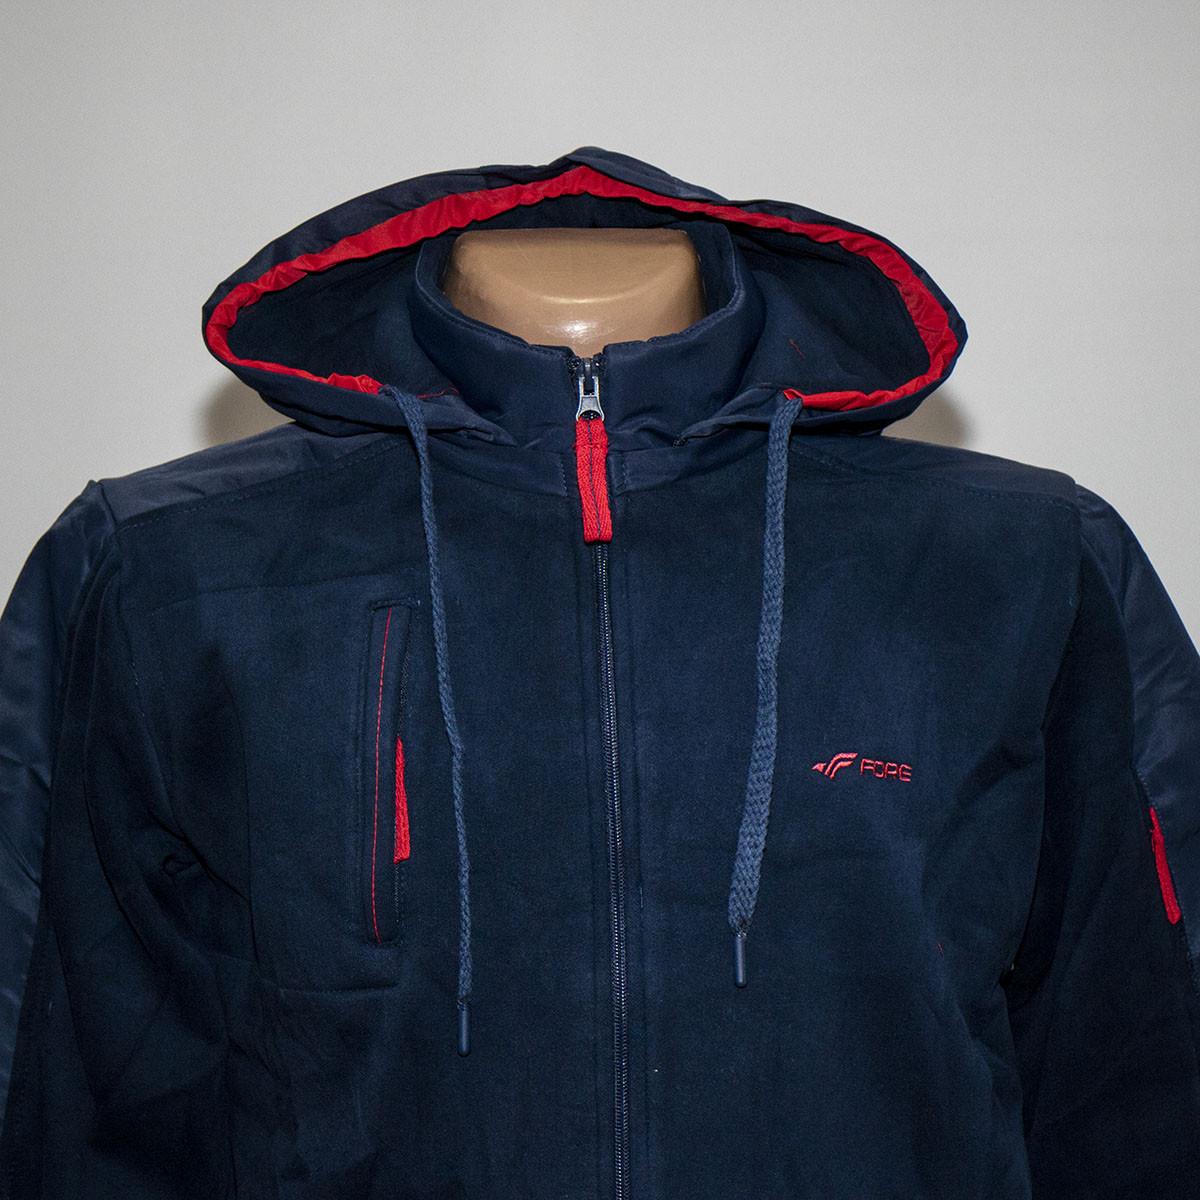 f5b2860b6cdd Теплый мужской спортивный костюм с капюшоном трехнитка т.м. Fore 5330